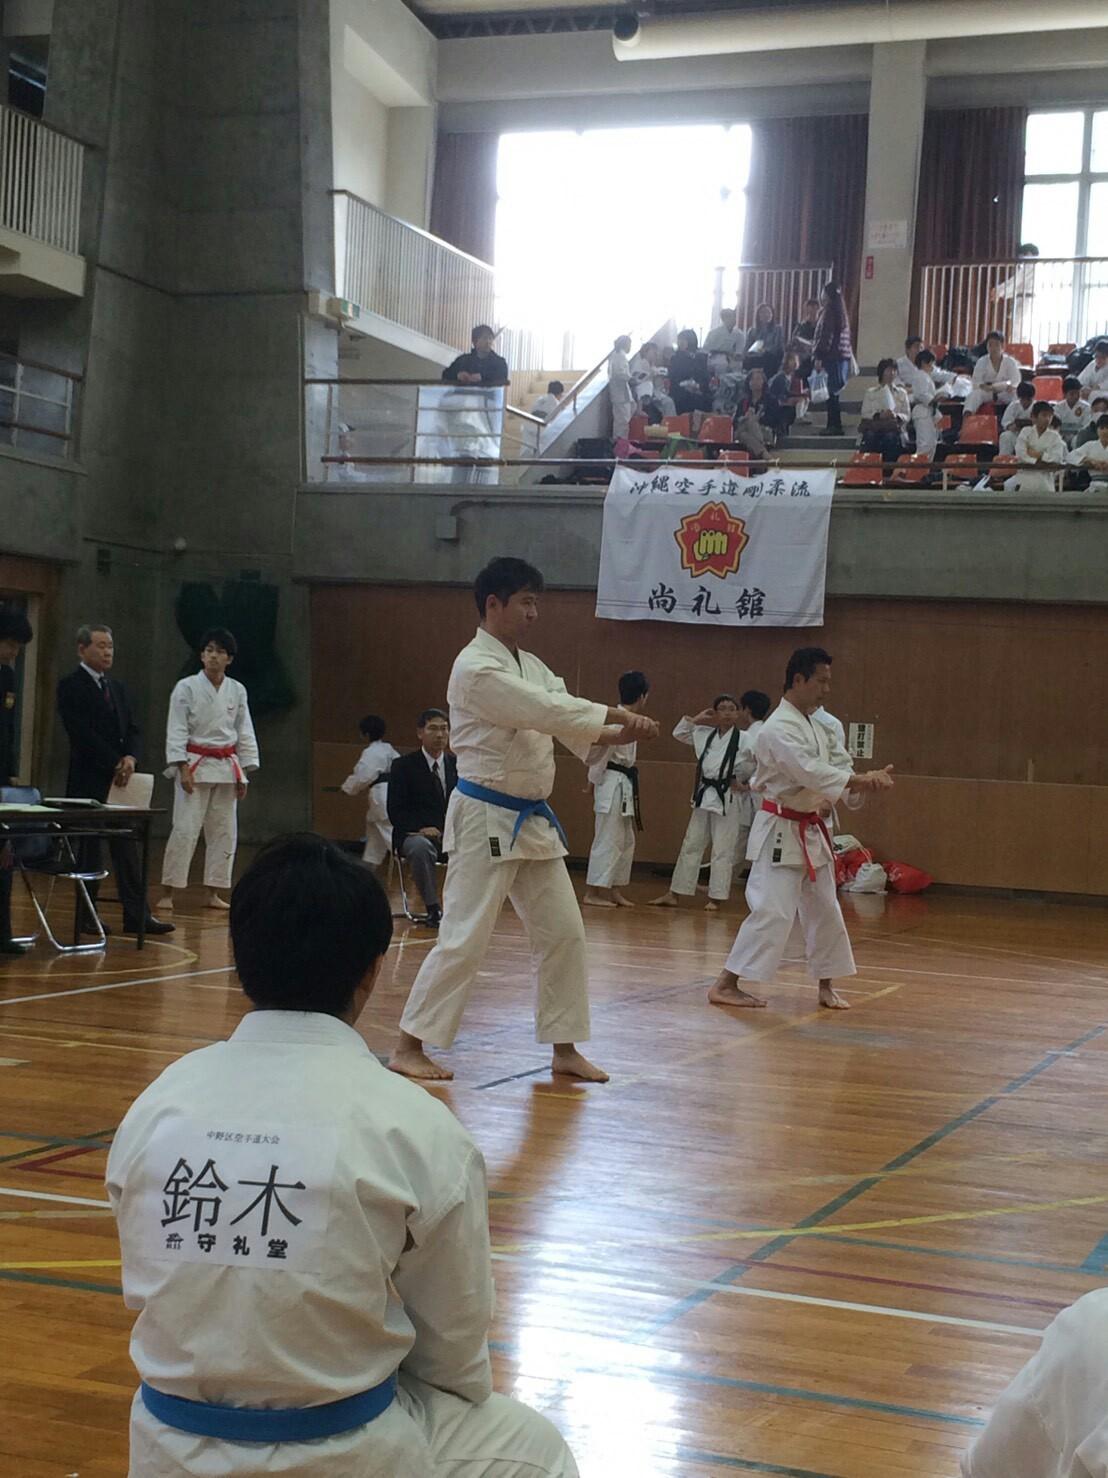 Nakano Karate tournament, karate tournament in Tokyo